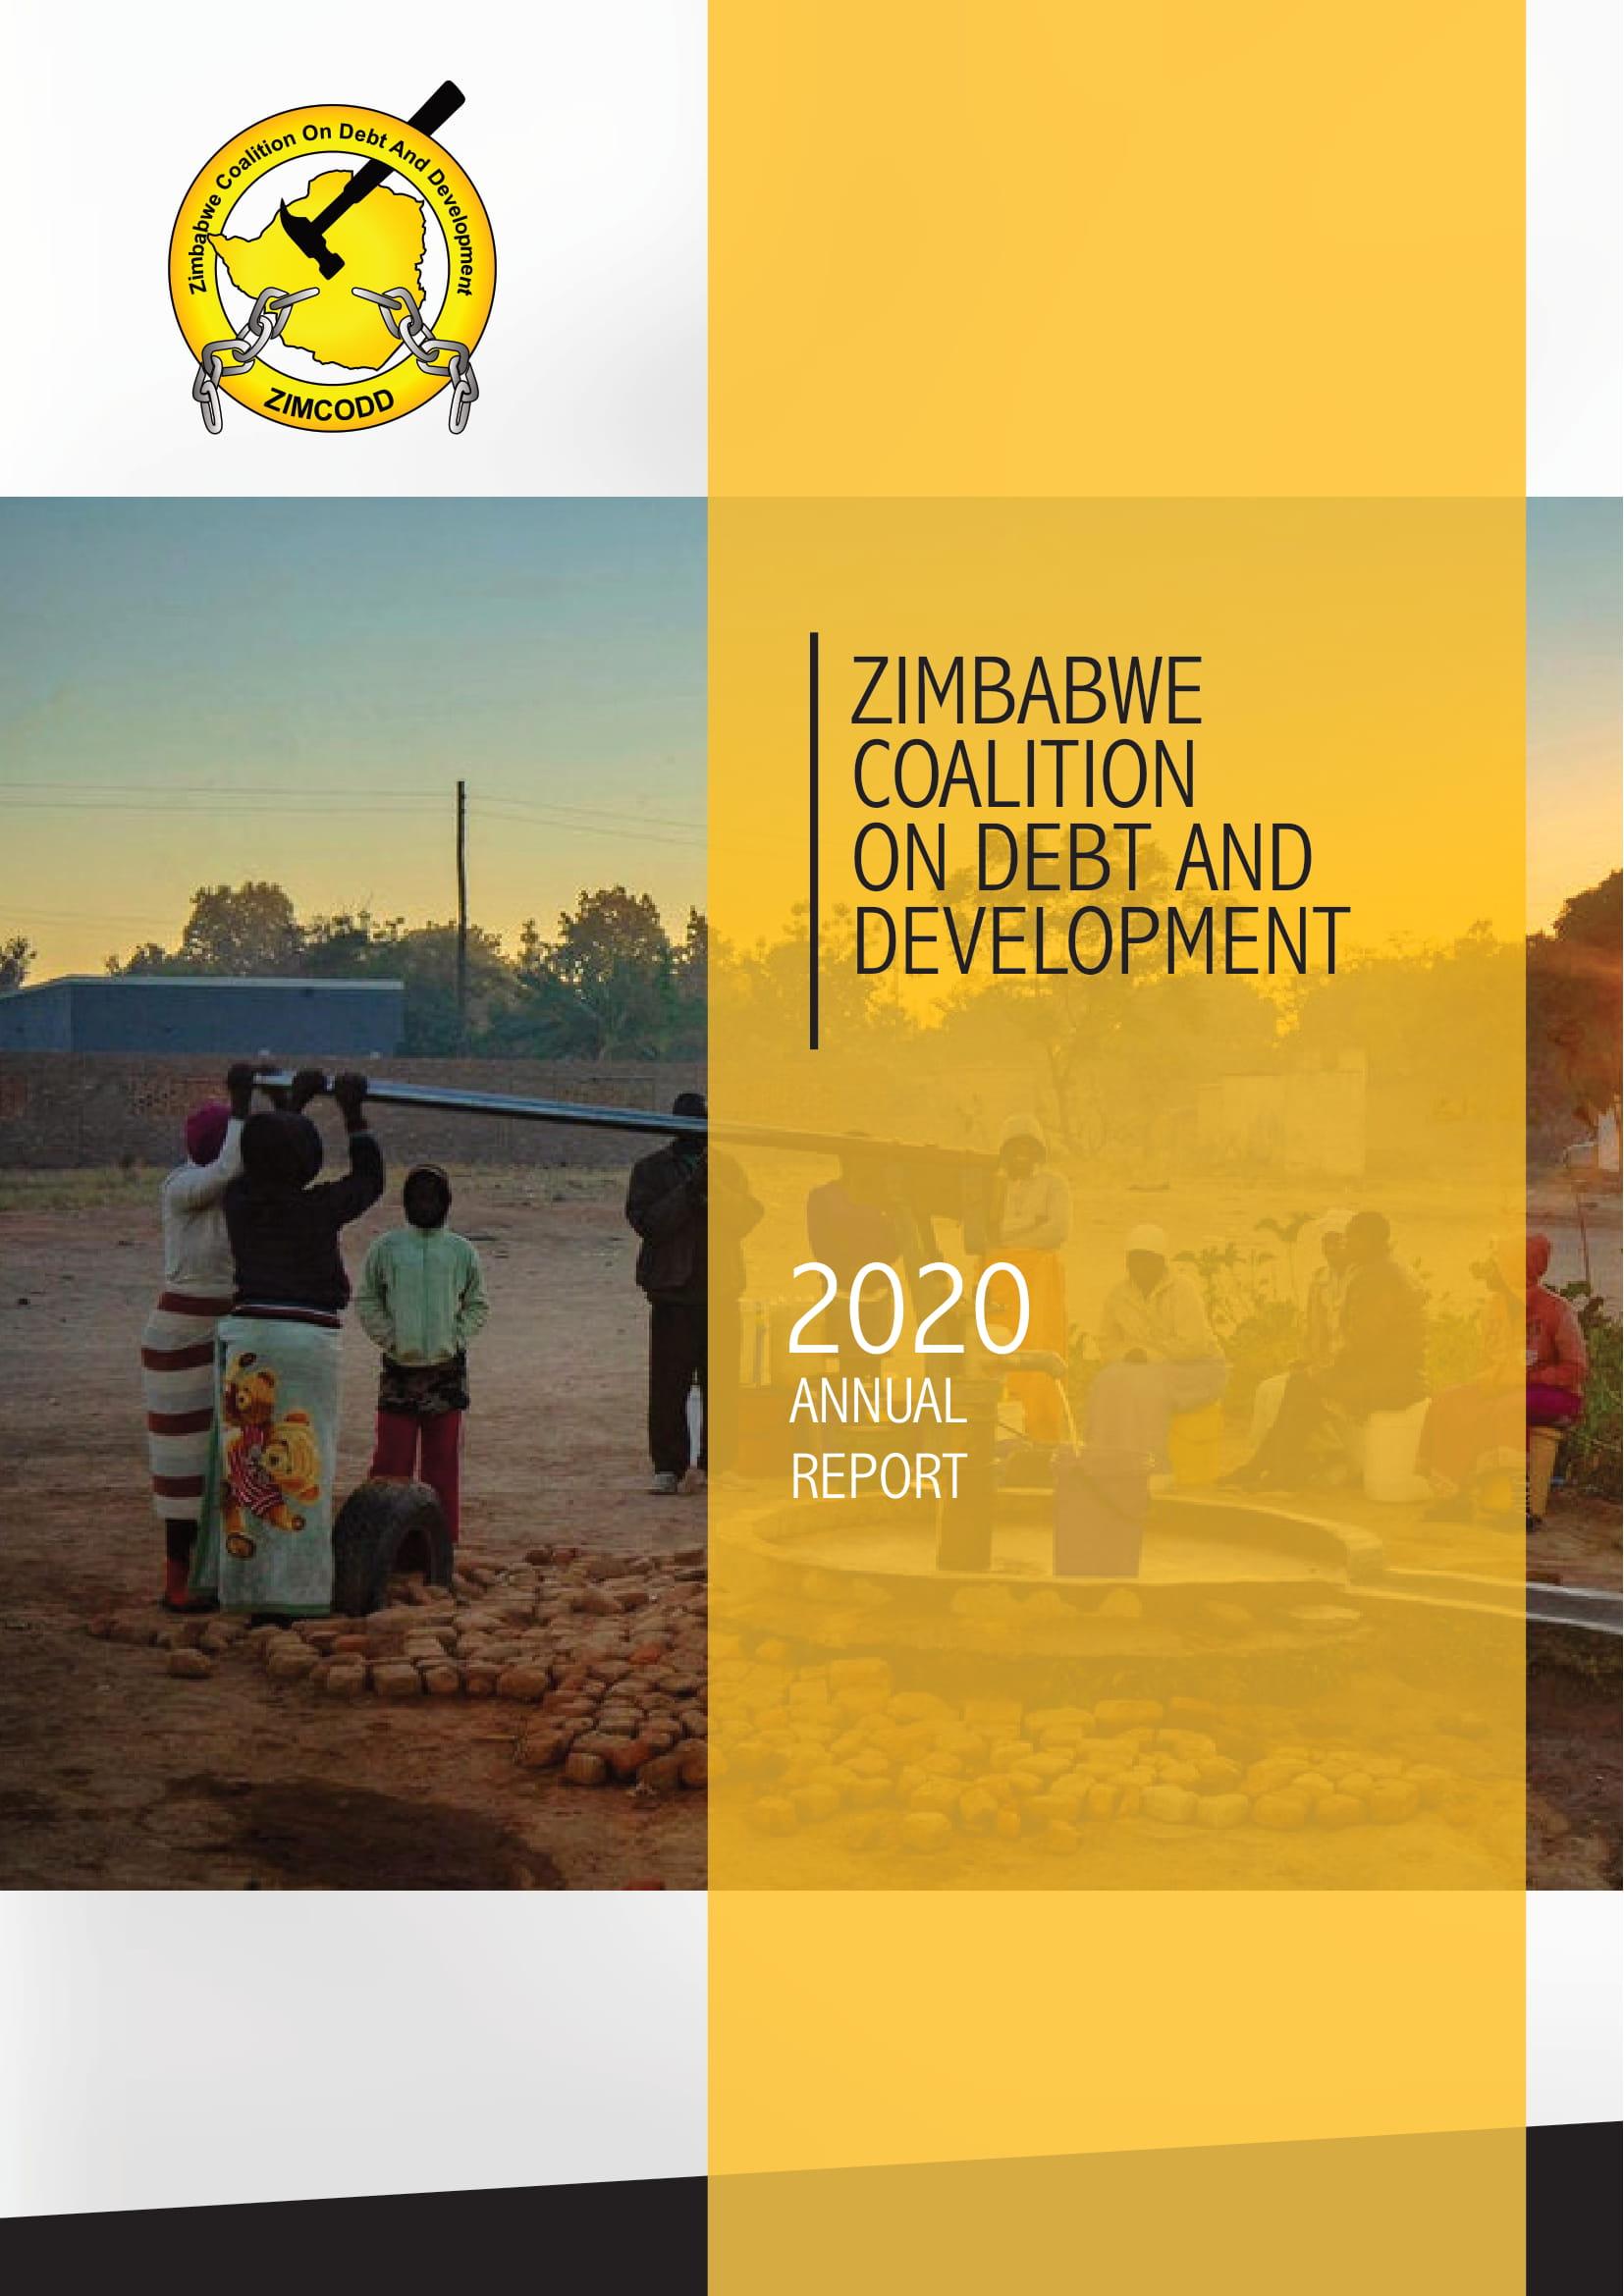 zimcodd Annual report_091602-01